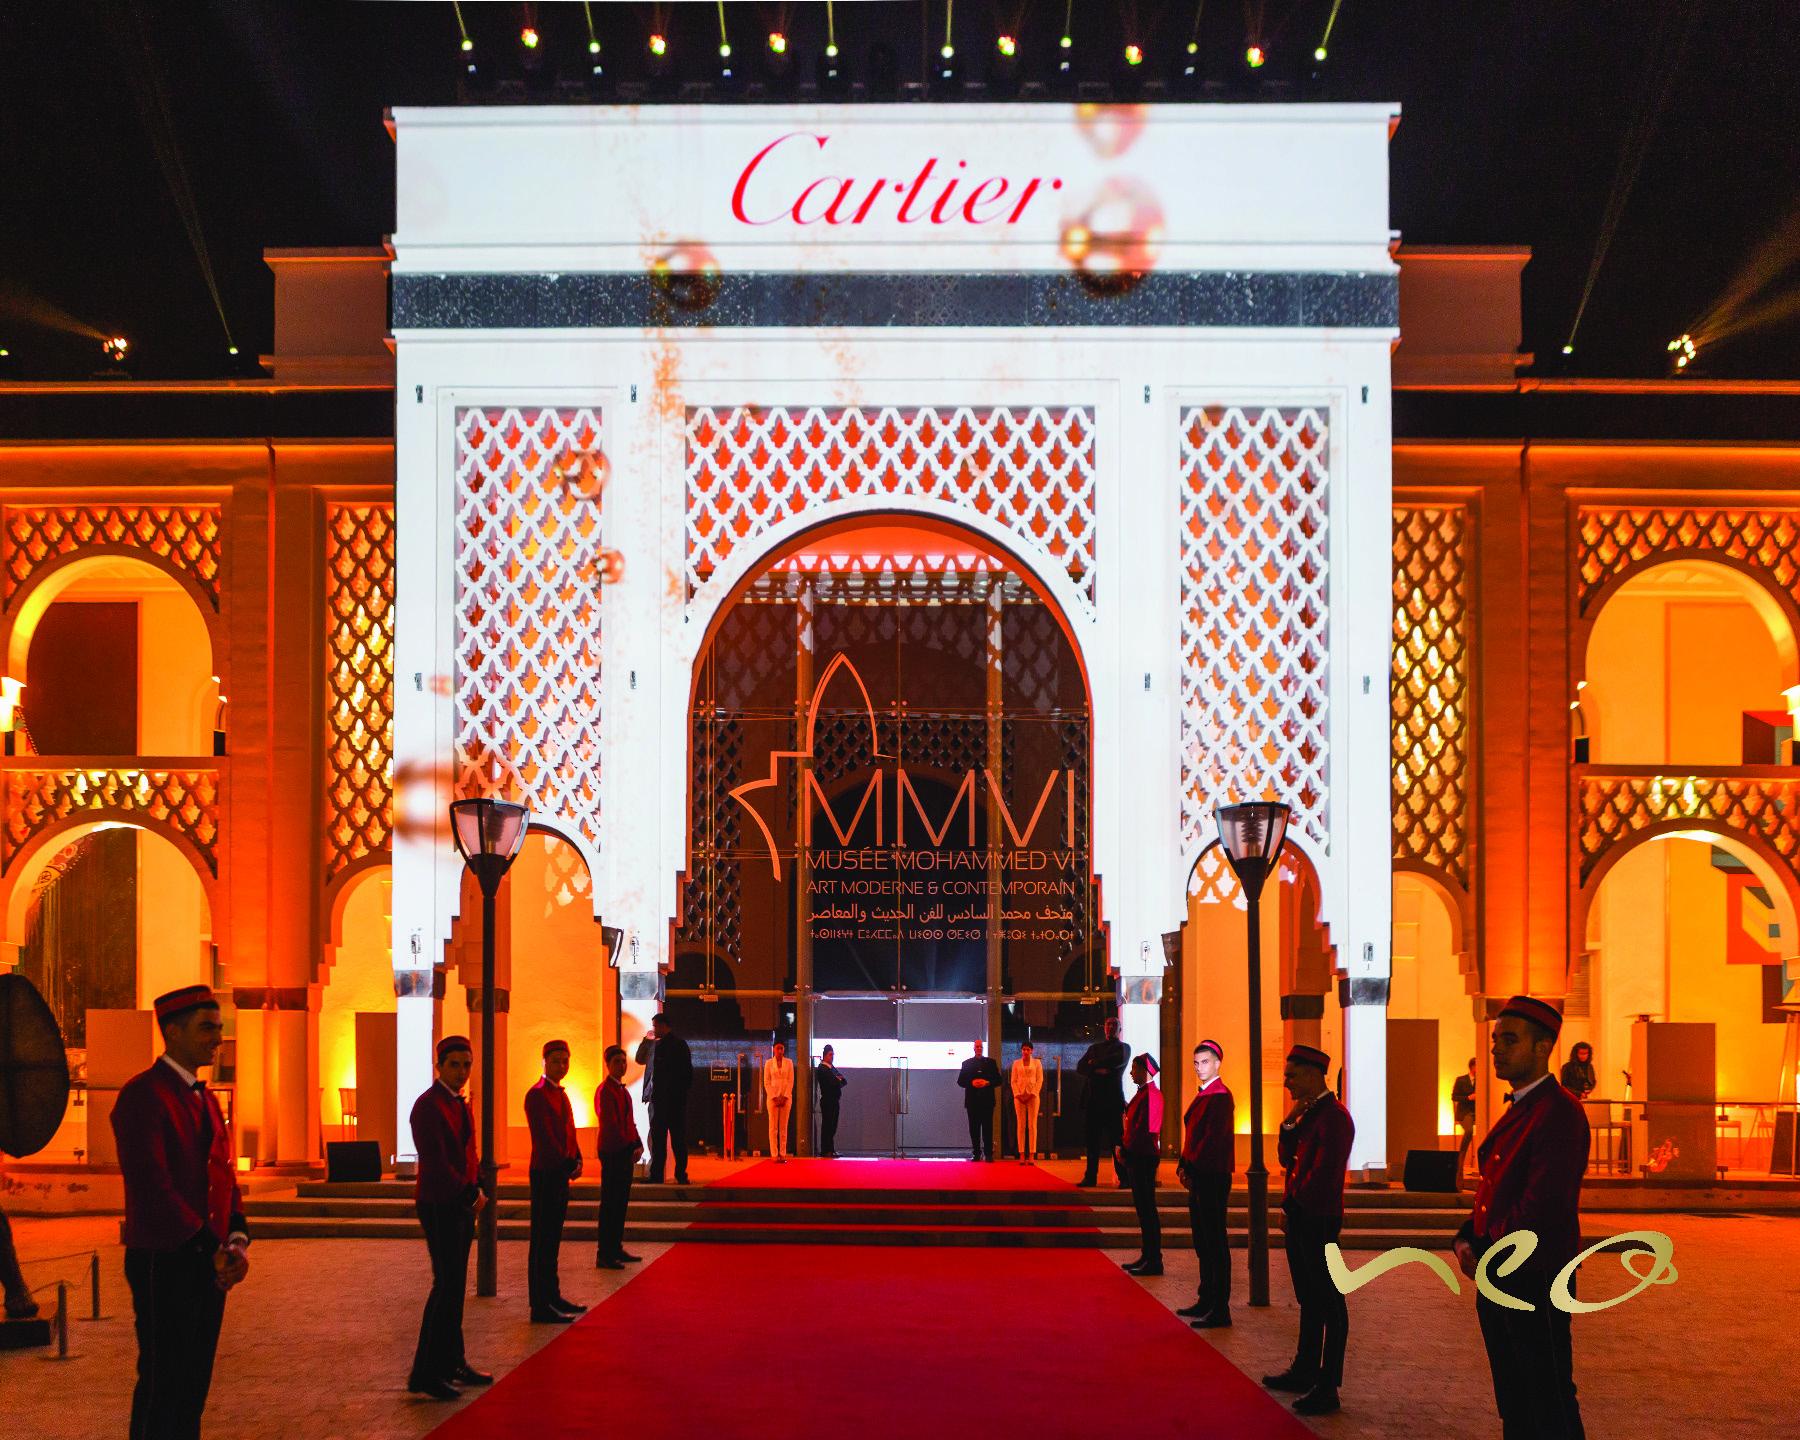 Cartier @ Musée Mohammed VI d'Art Moderne et Contemporain